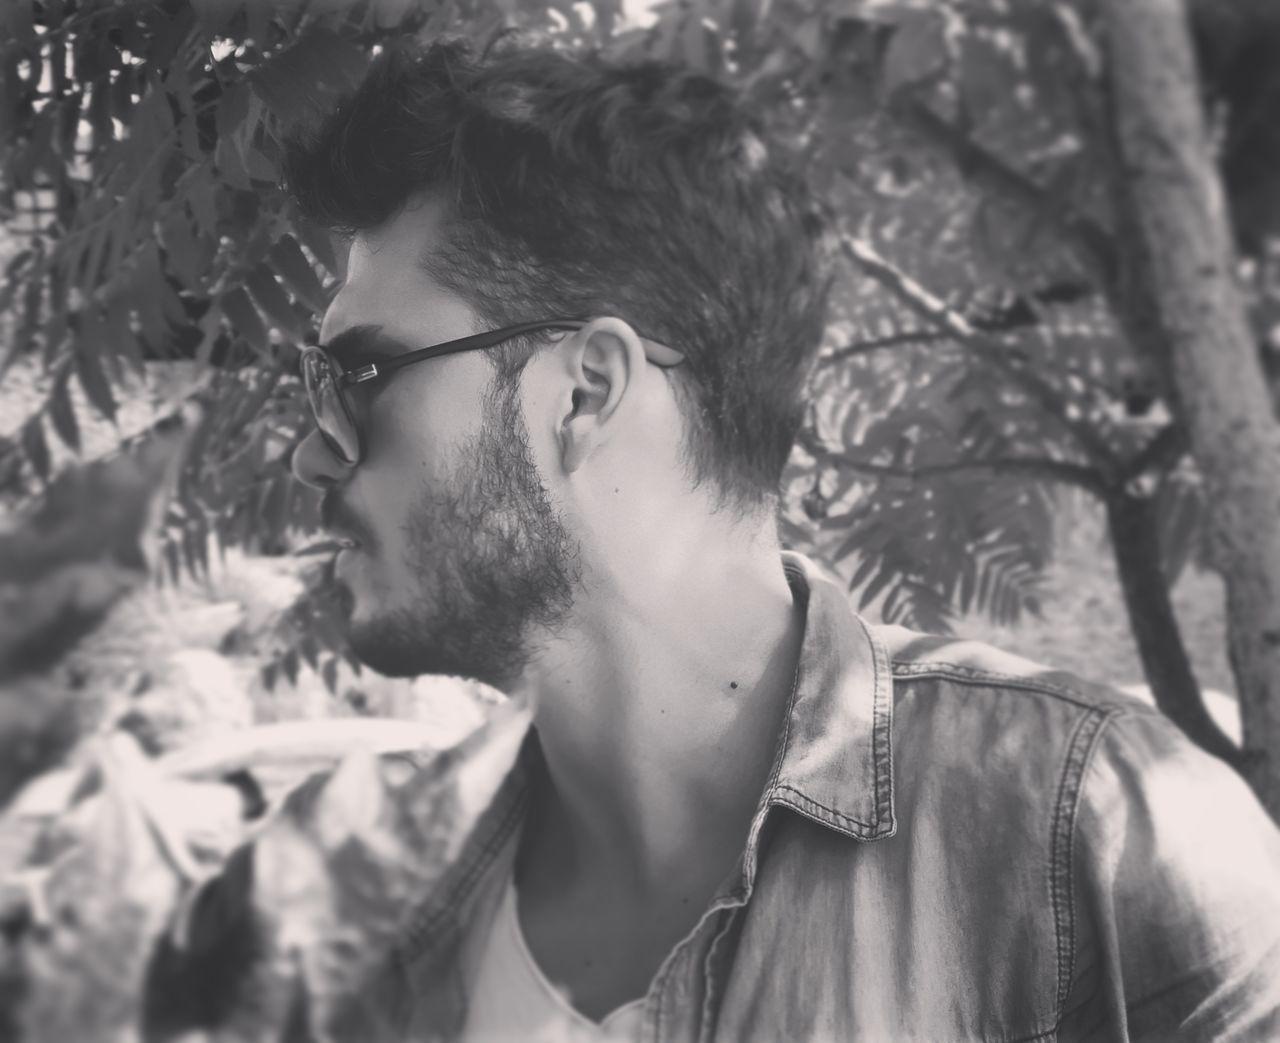 Goodmorning :) Blackandwhite Beard EyeEm Hello Turkey🙈😊 Goodmorning Sakal EyeEm Gallery First Eyeem Photo Hello World Thats Me  Ugly Face Antalyaturkey Gozluk Glasses EyeEm Best Edits EyeEm Nature Lover Türkiye Turkeyphotooftheday Self Portrait